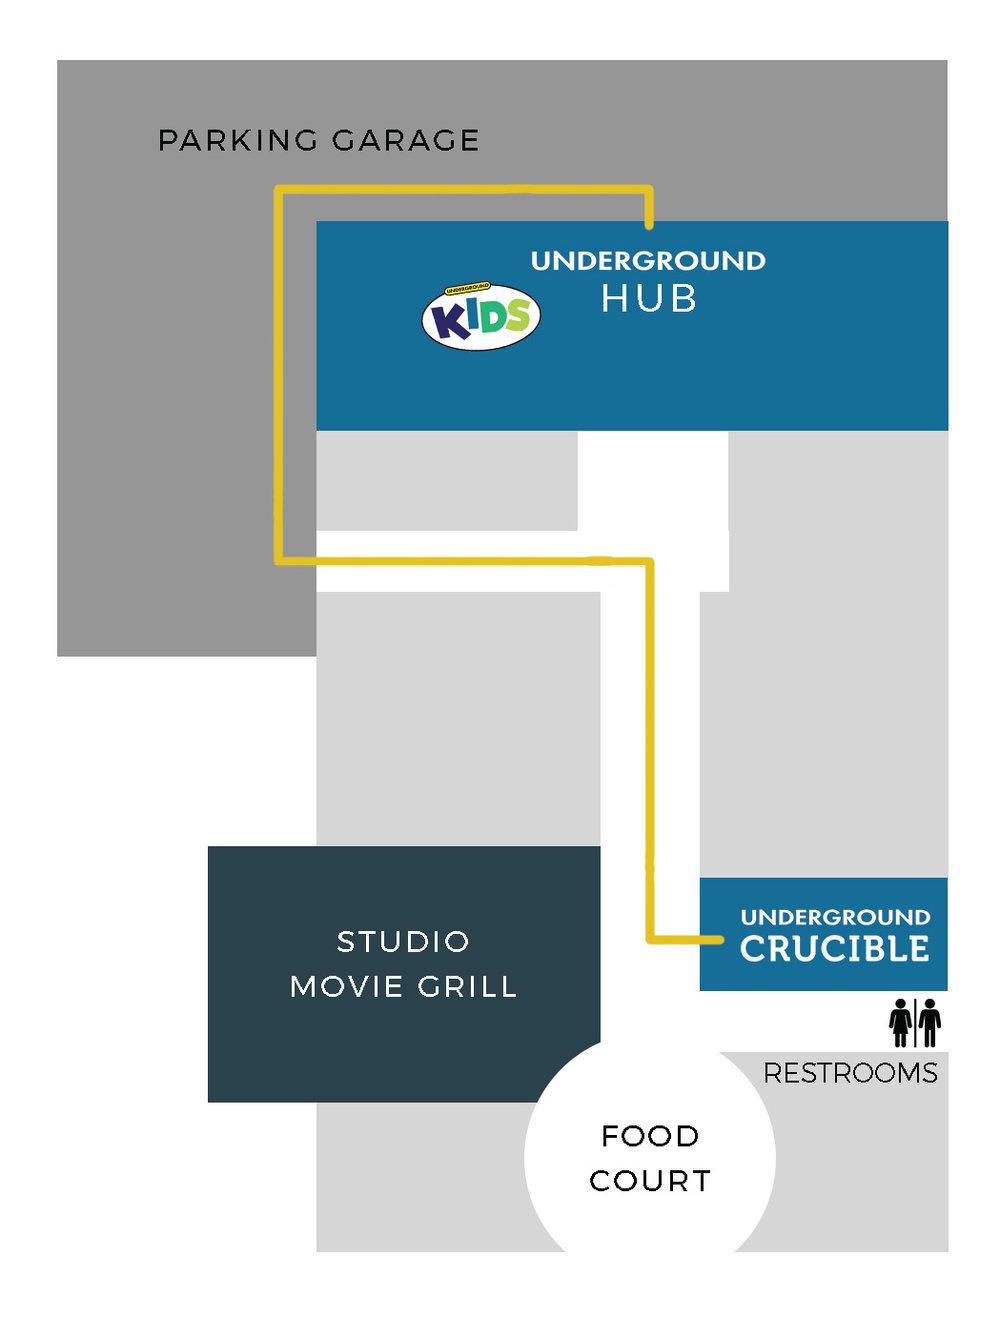 crucible kids direction info-1.jpg